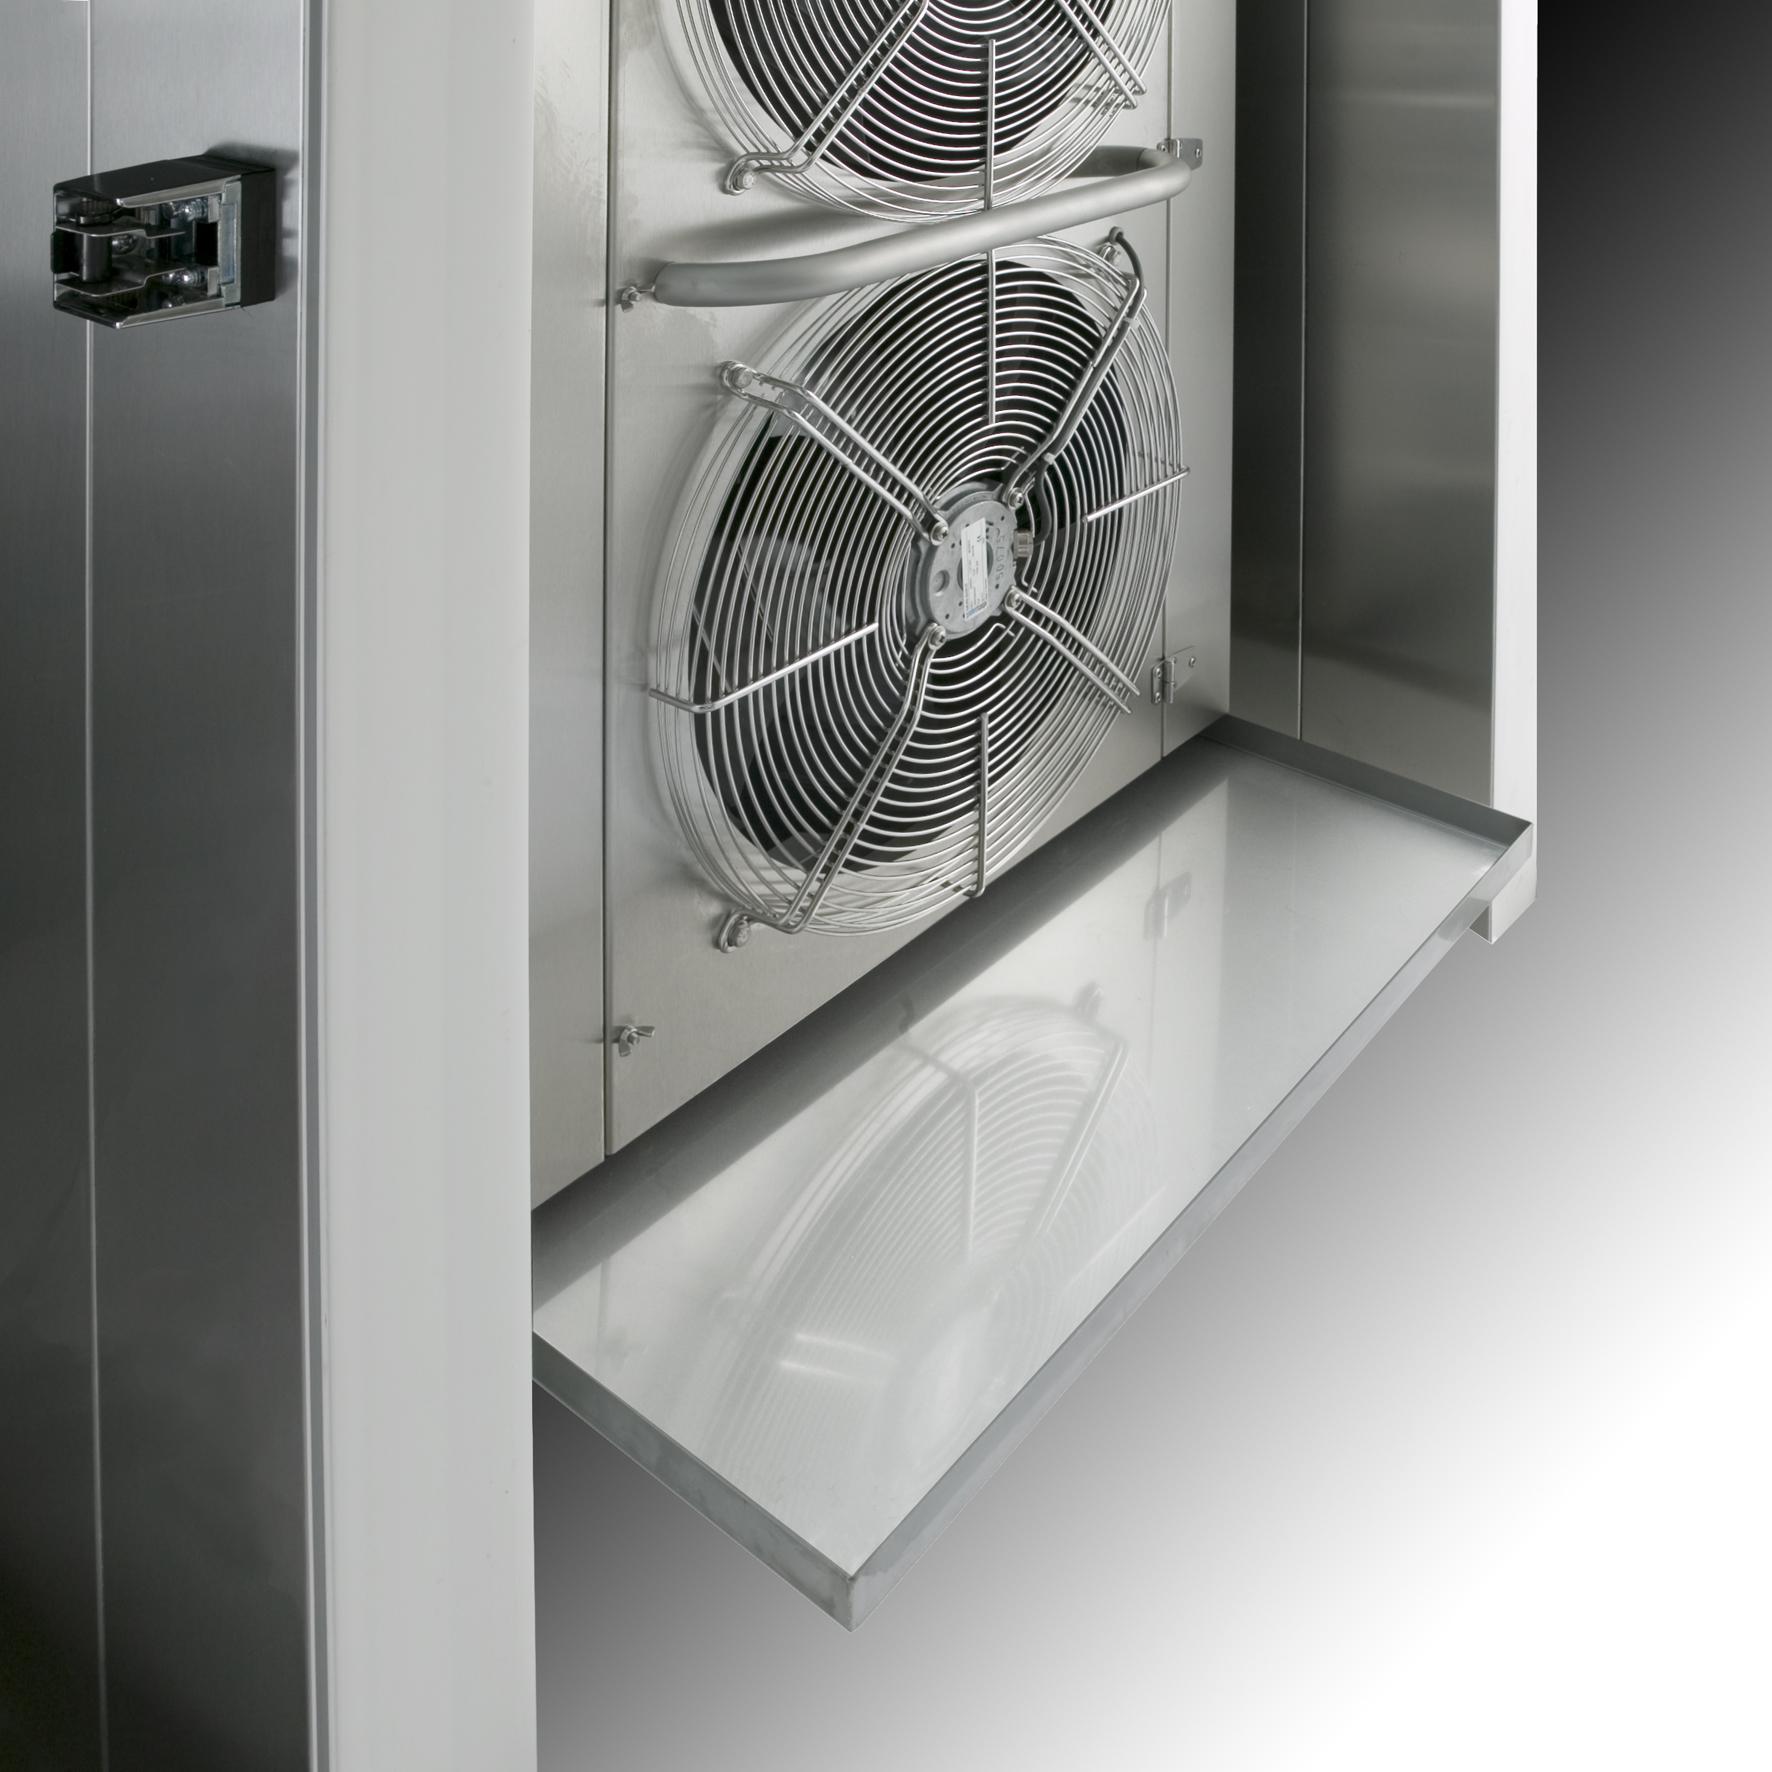 Gram Kps Roll In Blast Chillers Freezers Capital